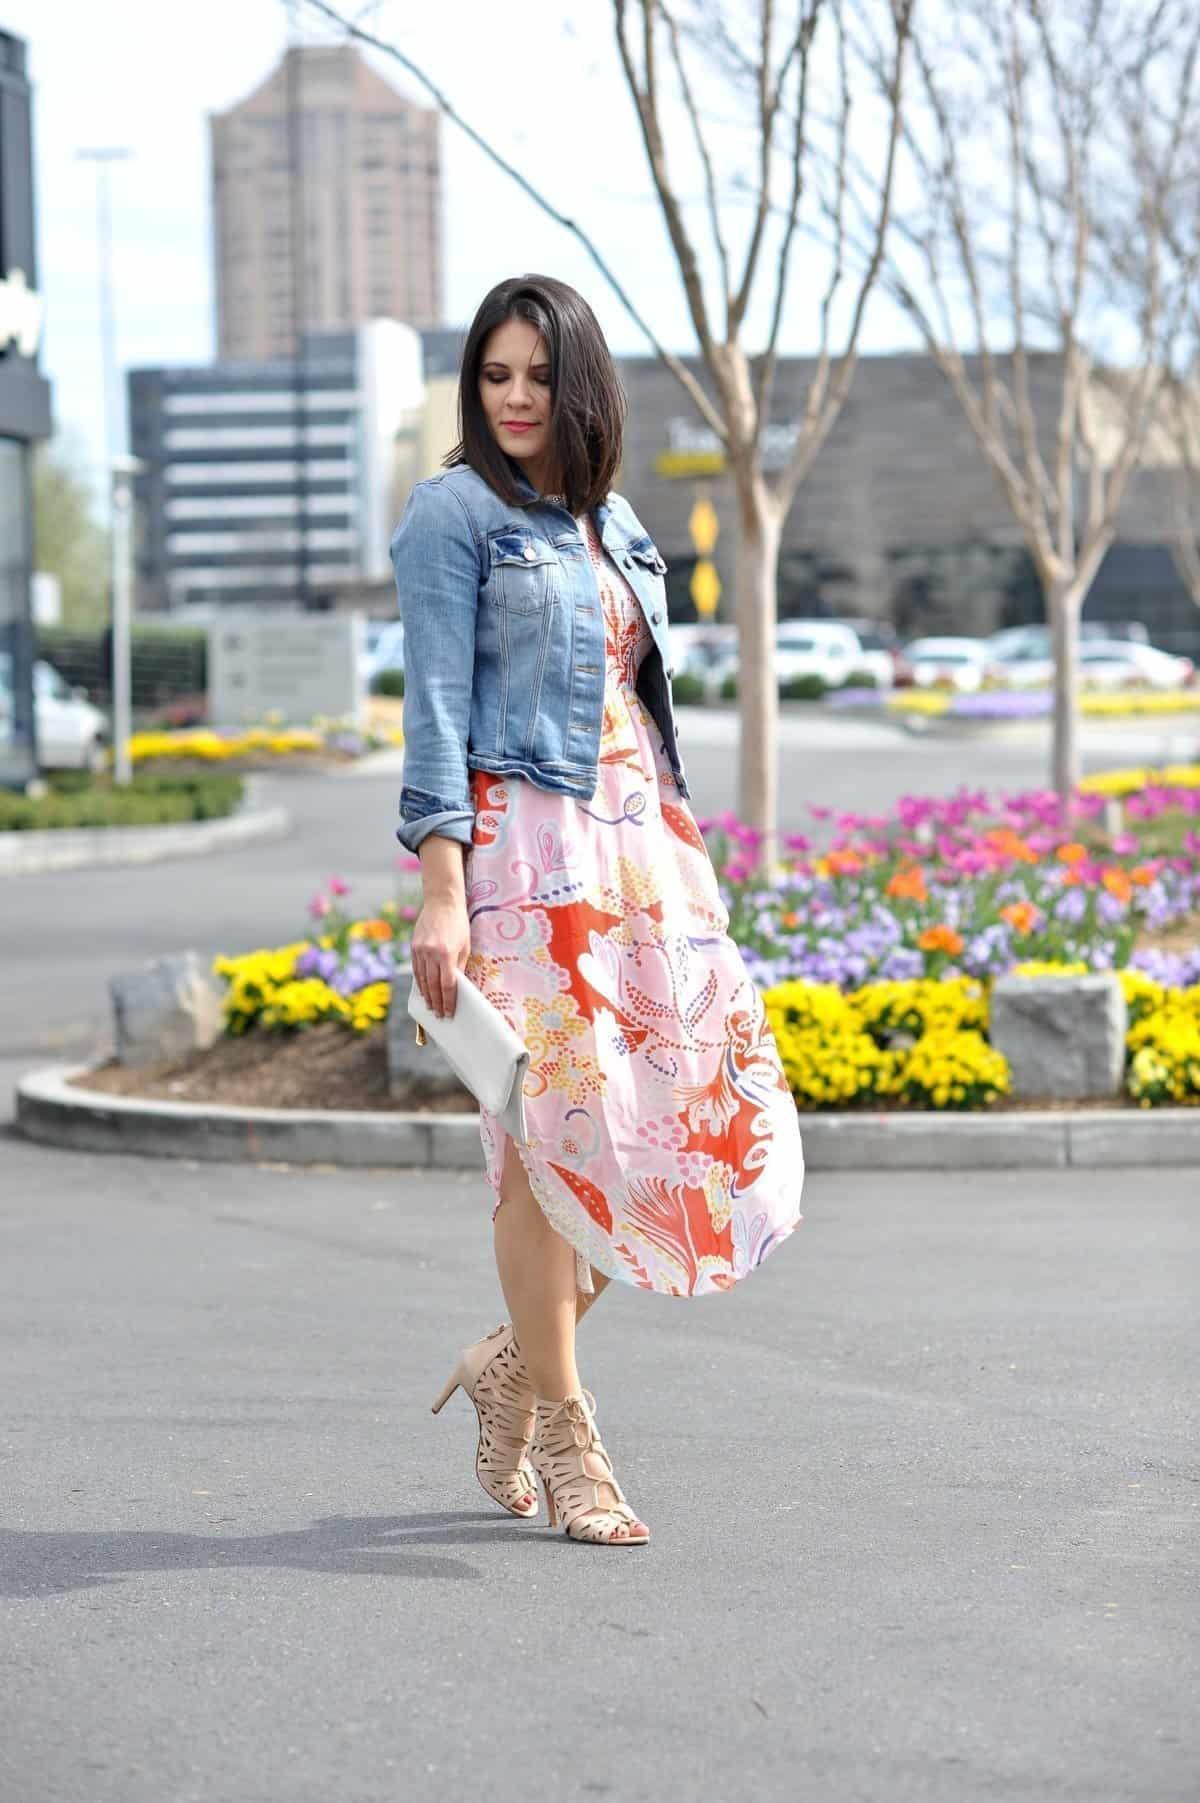 Banjanan Cochella Dress - printed floral dress for summer - My Style Vita - @mystylevita - 3